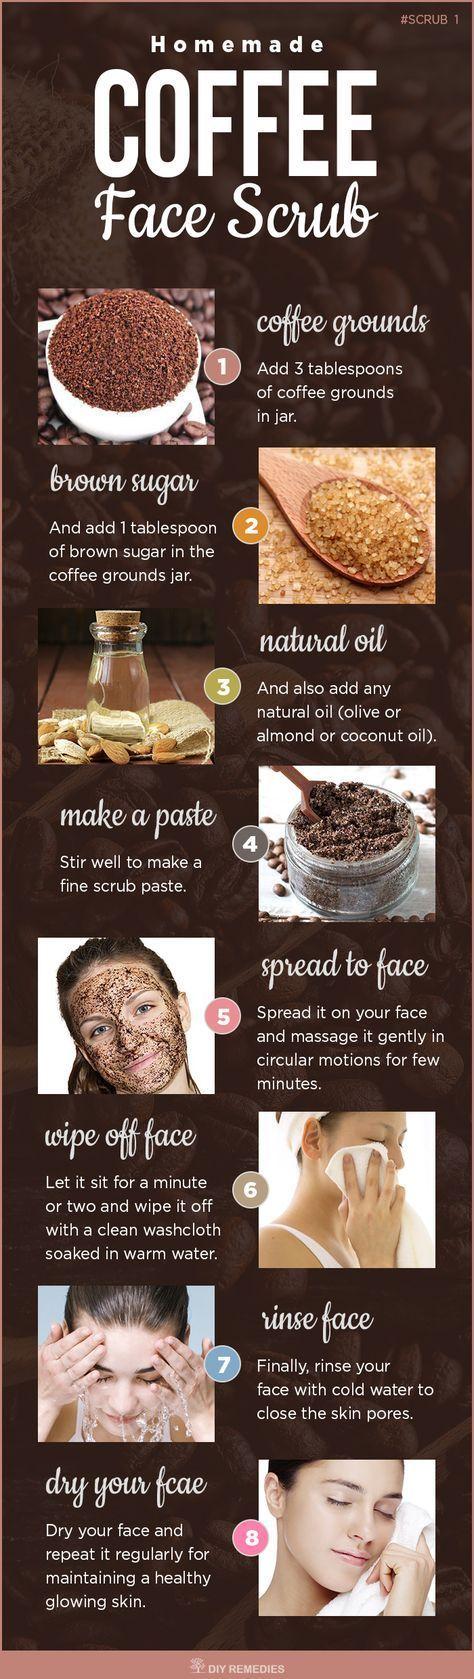 Homemade Natural Face Coffee Scrub